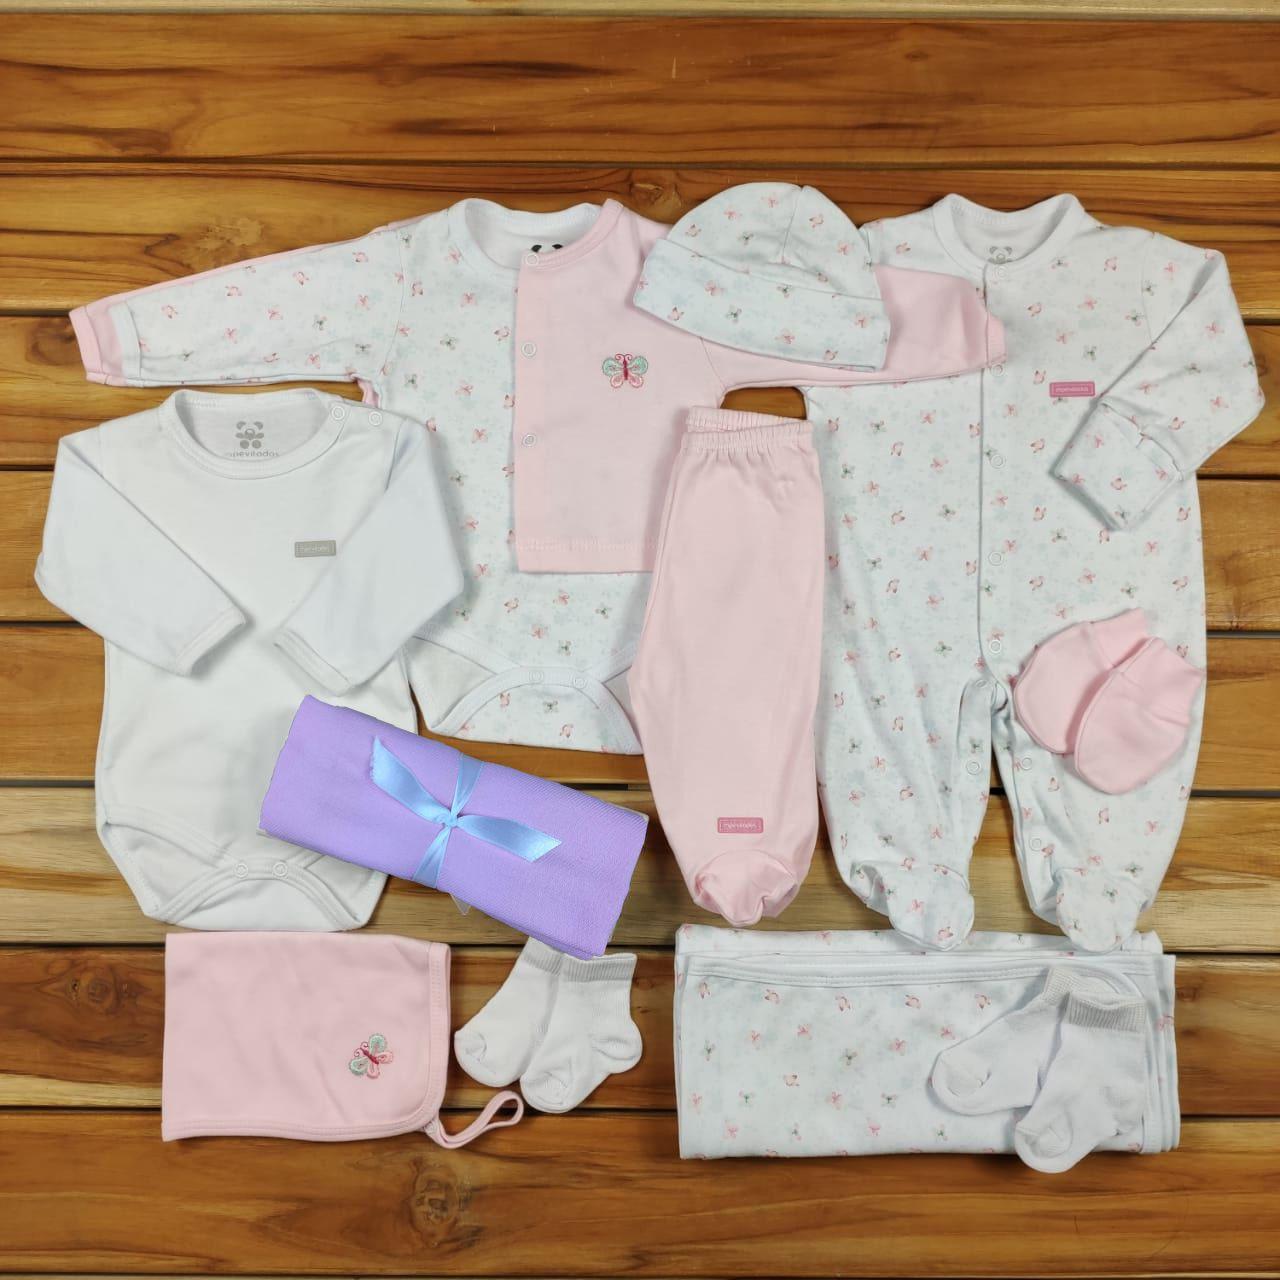 Kit  Maternidade  Branco e Rosa - 12 Peças